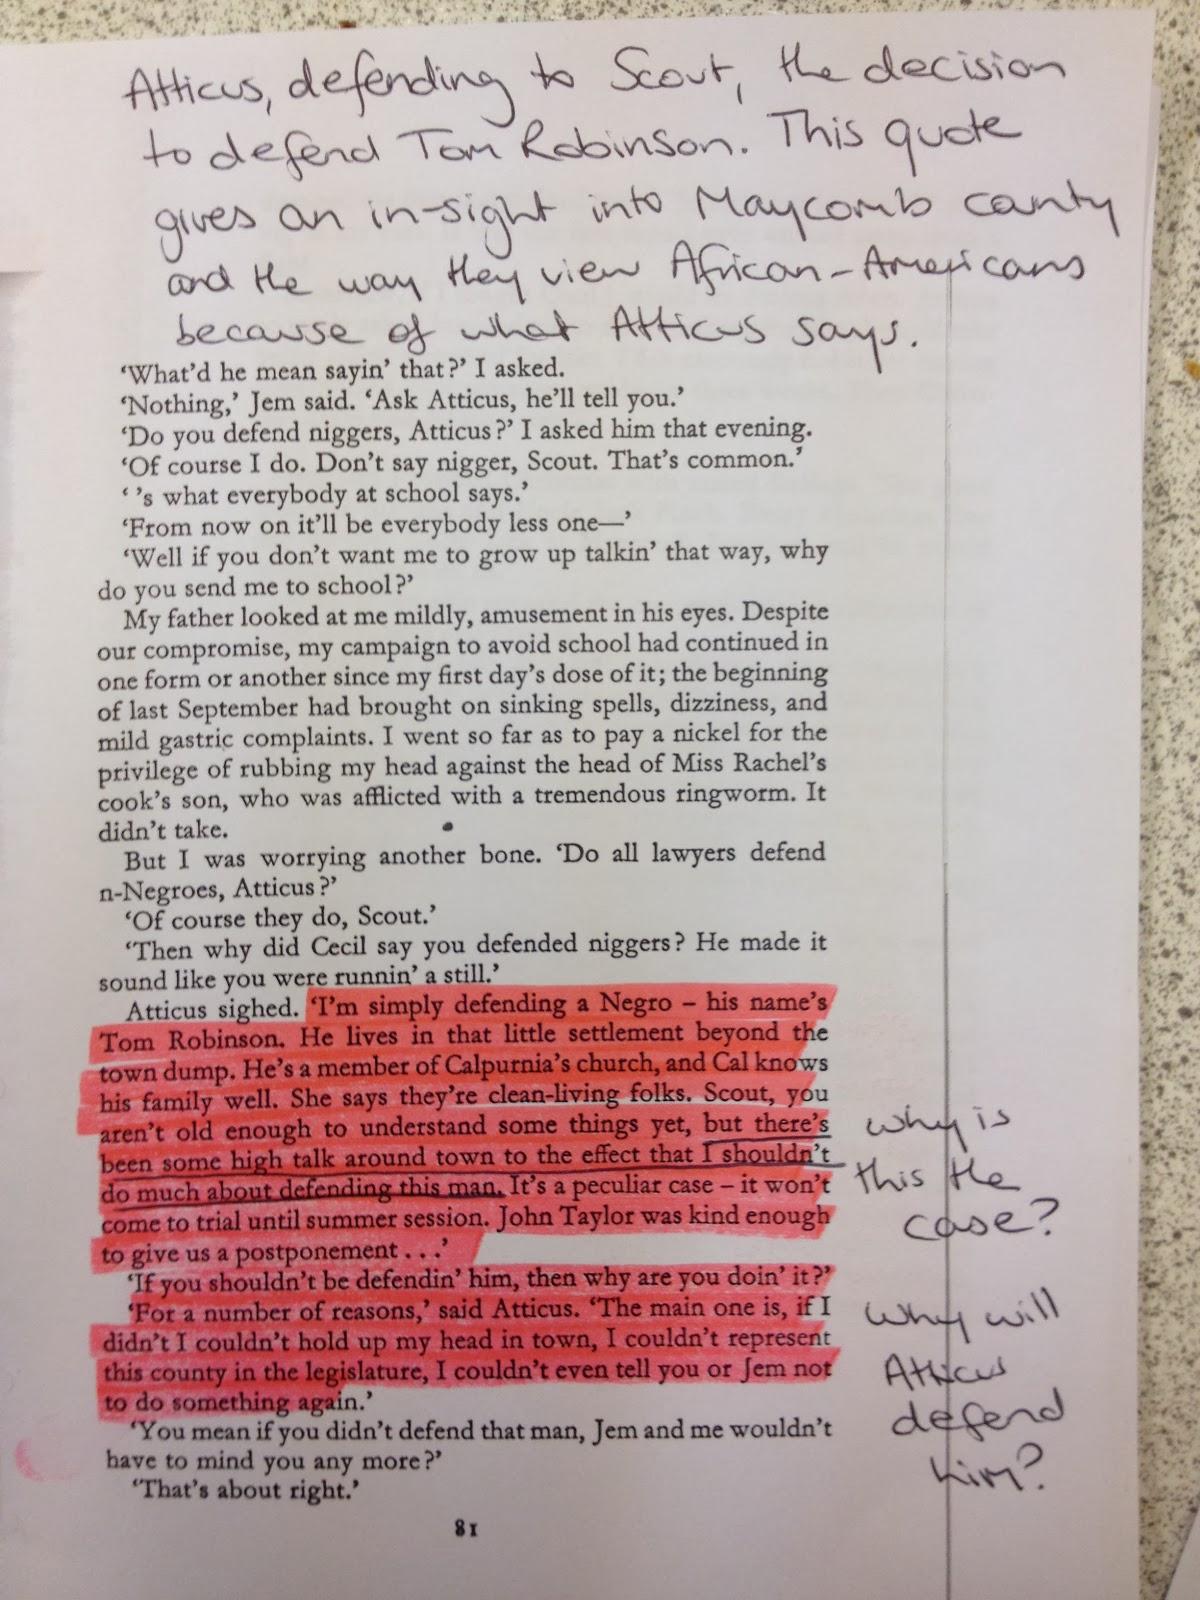 Law of demand essay